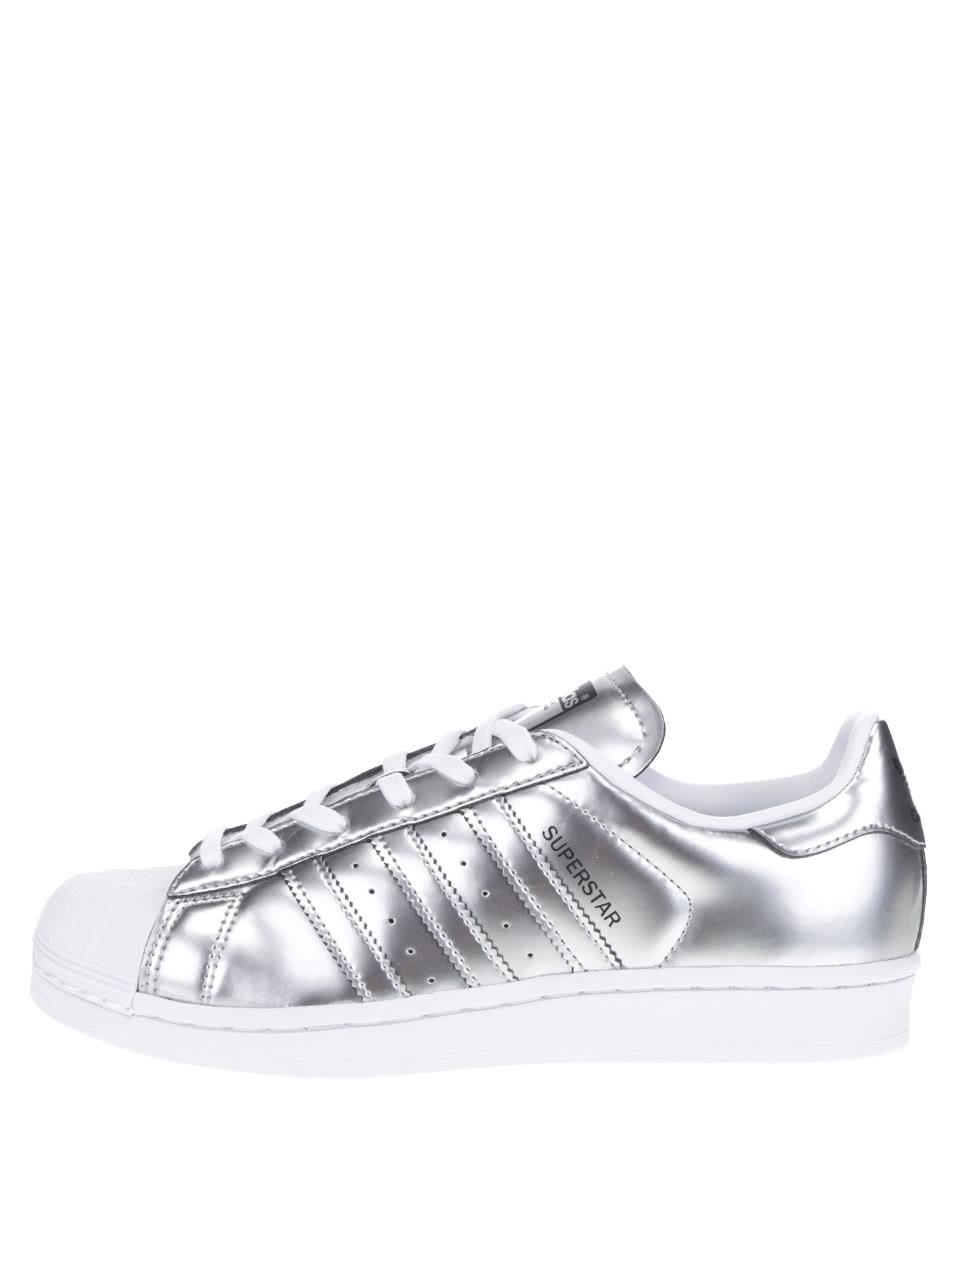 Dámské metalické tenisky v stříbrné barvě adidas Originals Superstar ... 135bf786f12